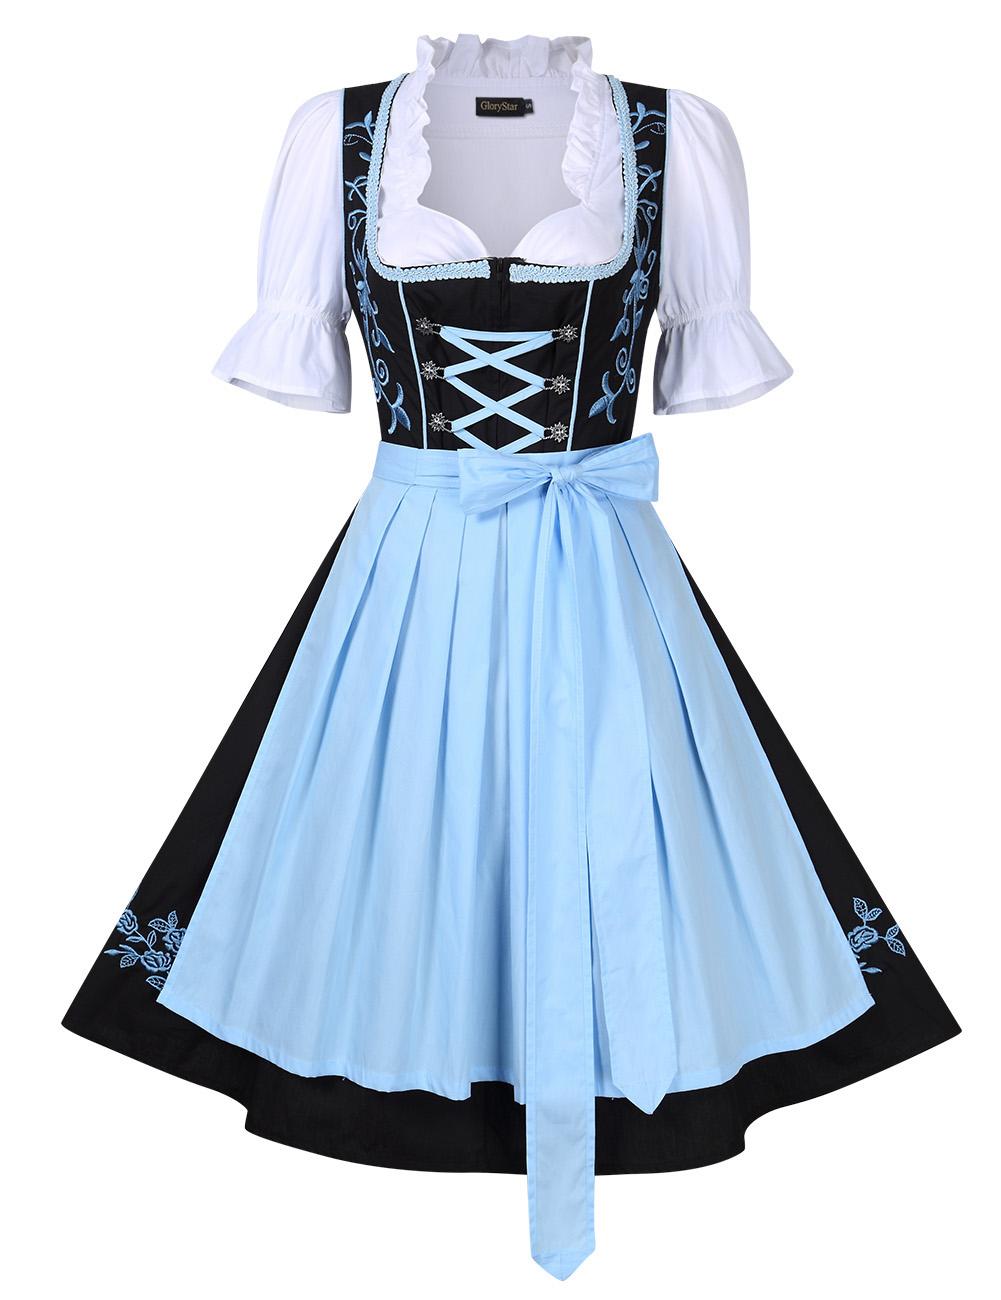 AU-Cheers-Traditional-German-Girl-Oktoberfest-Dirndl-Fancy-Dress-Servant-Costume